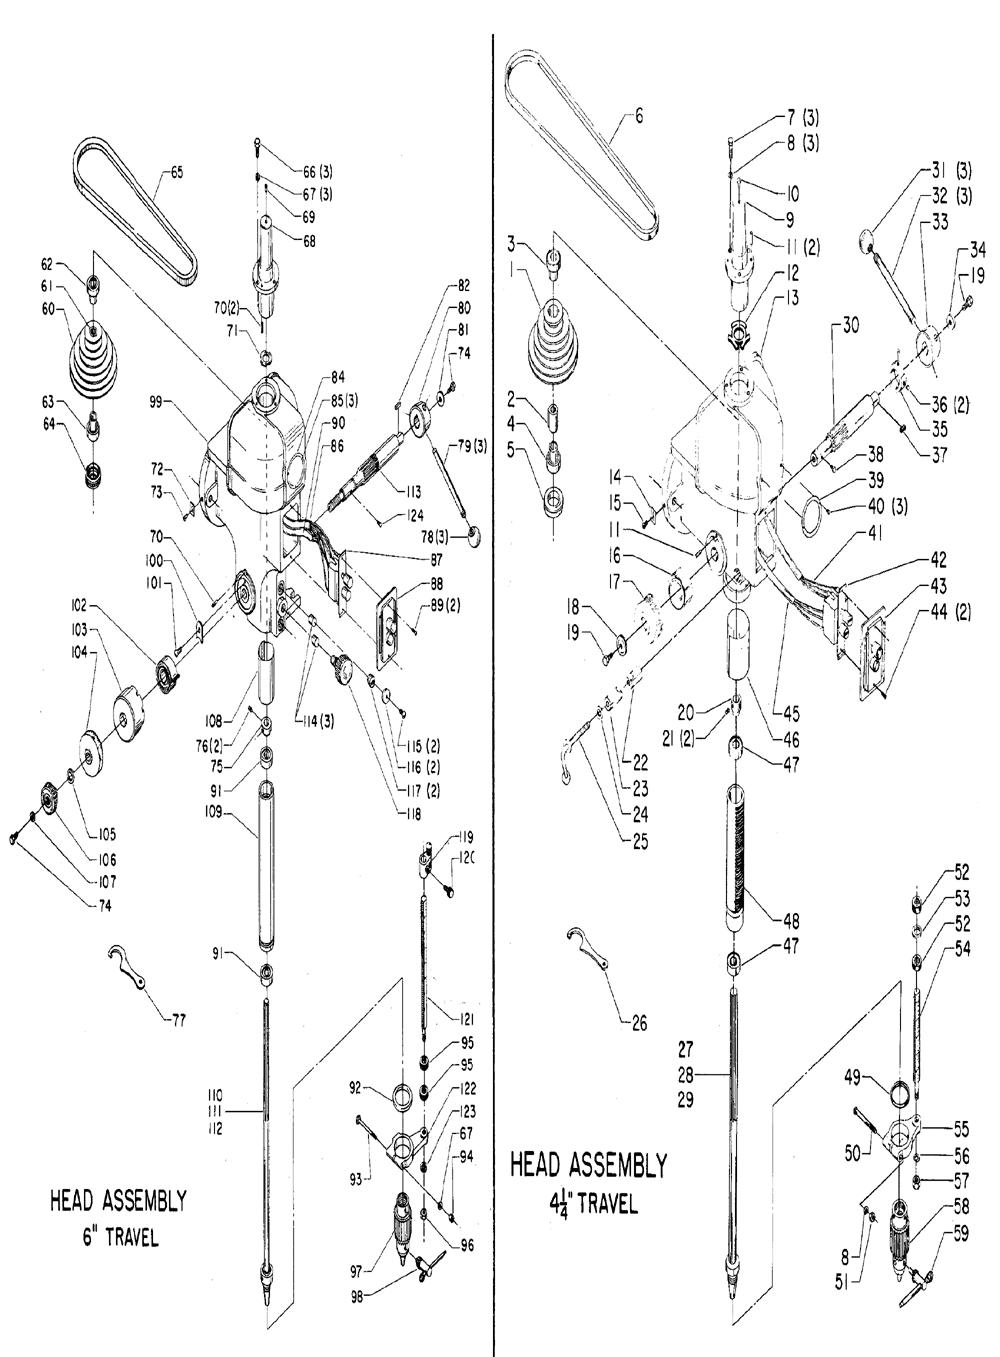 Diagram Ni Usb 6008 Wiring Diagram Full Version Hd Quality Wiring Diagram Defschematics2l Romaindanza It